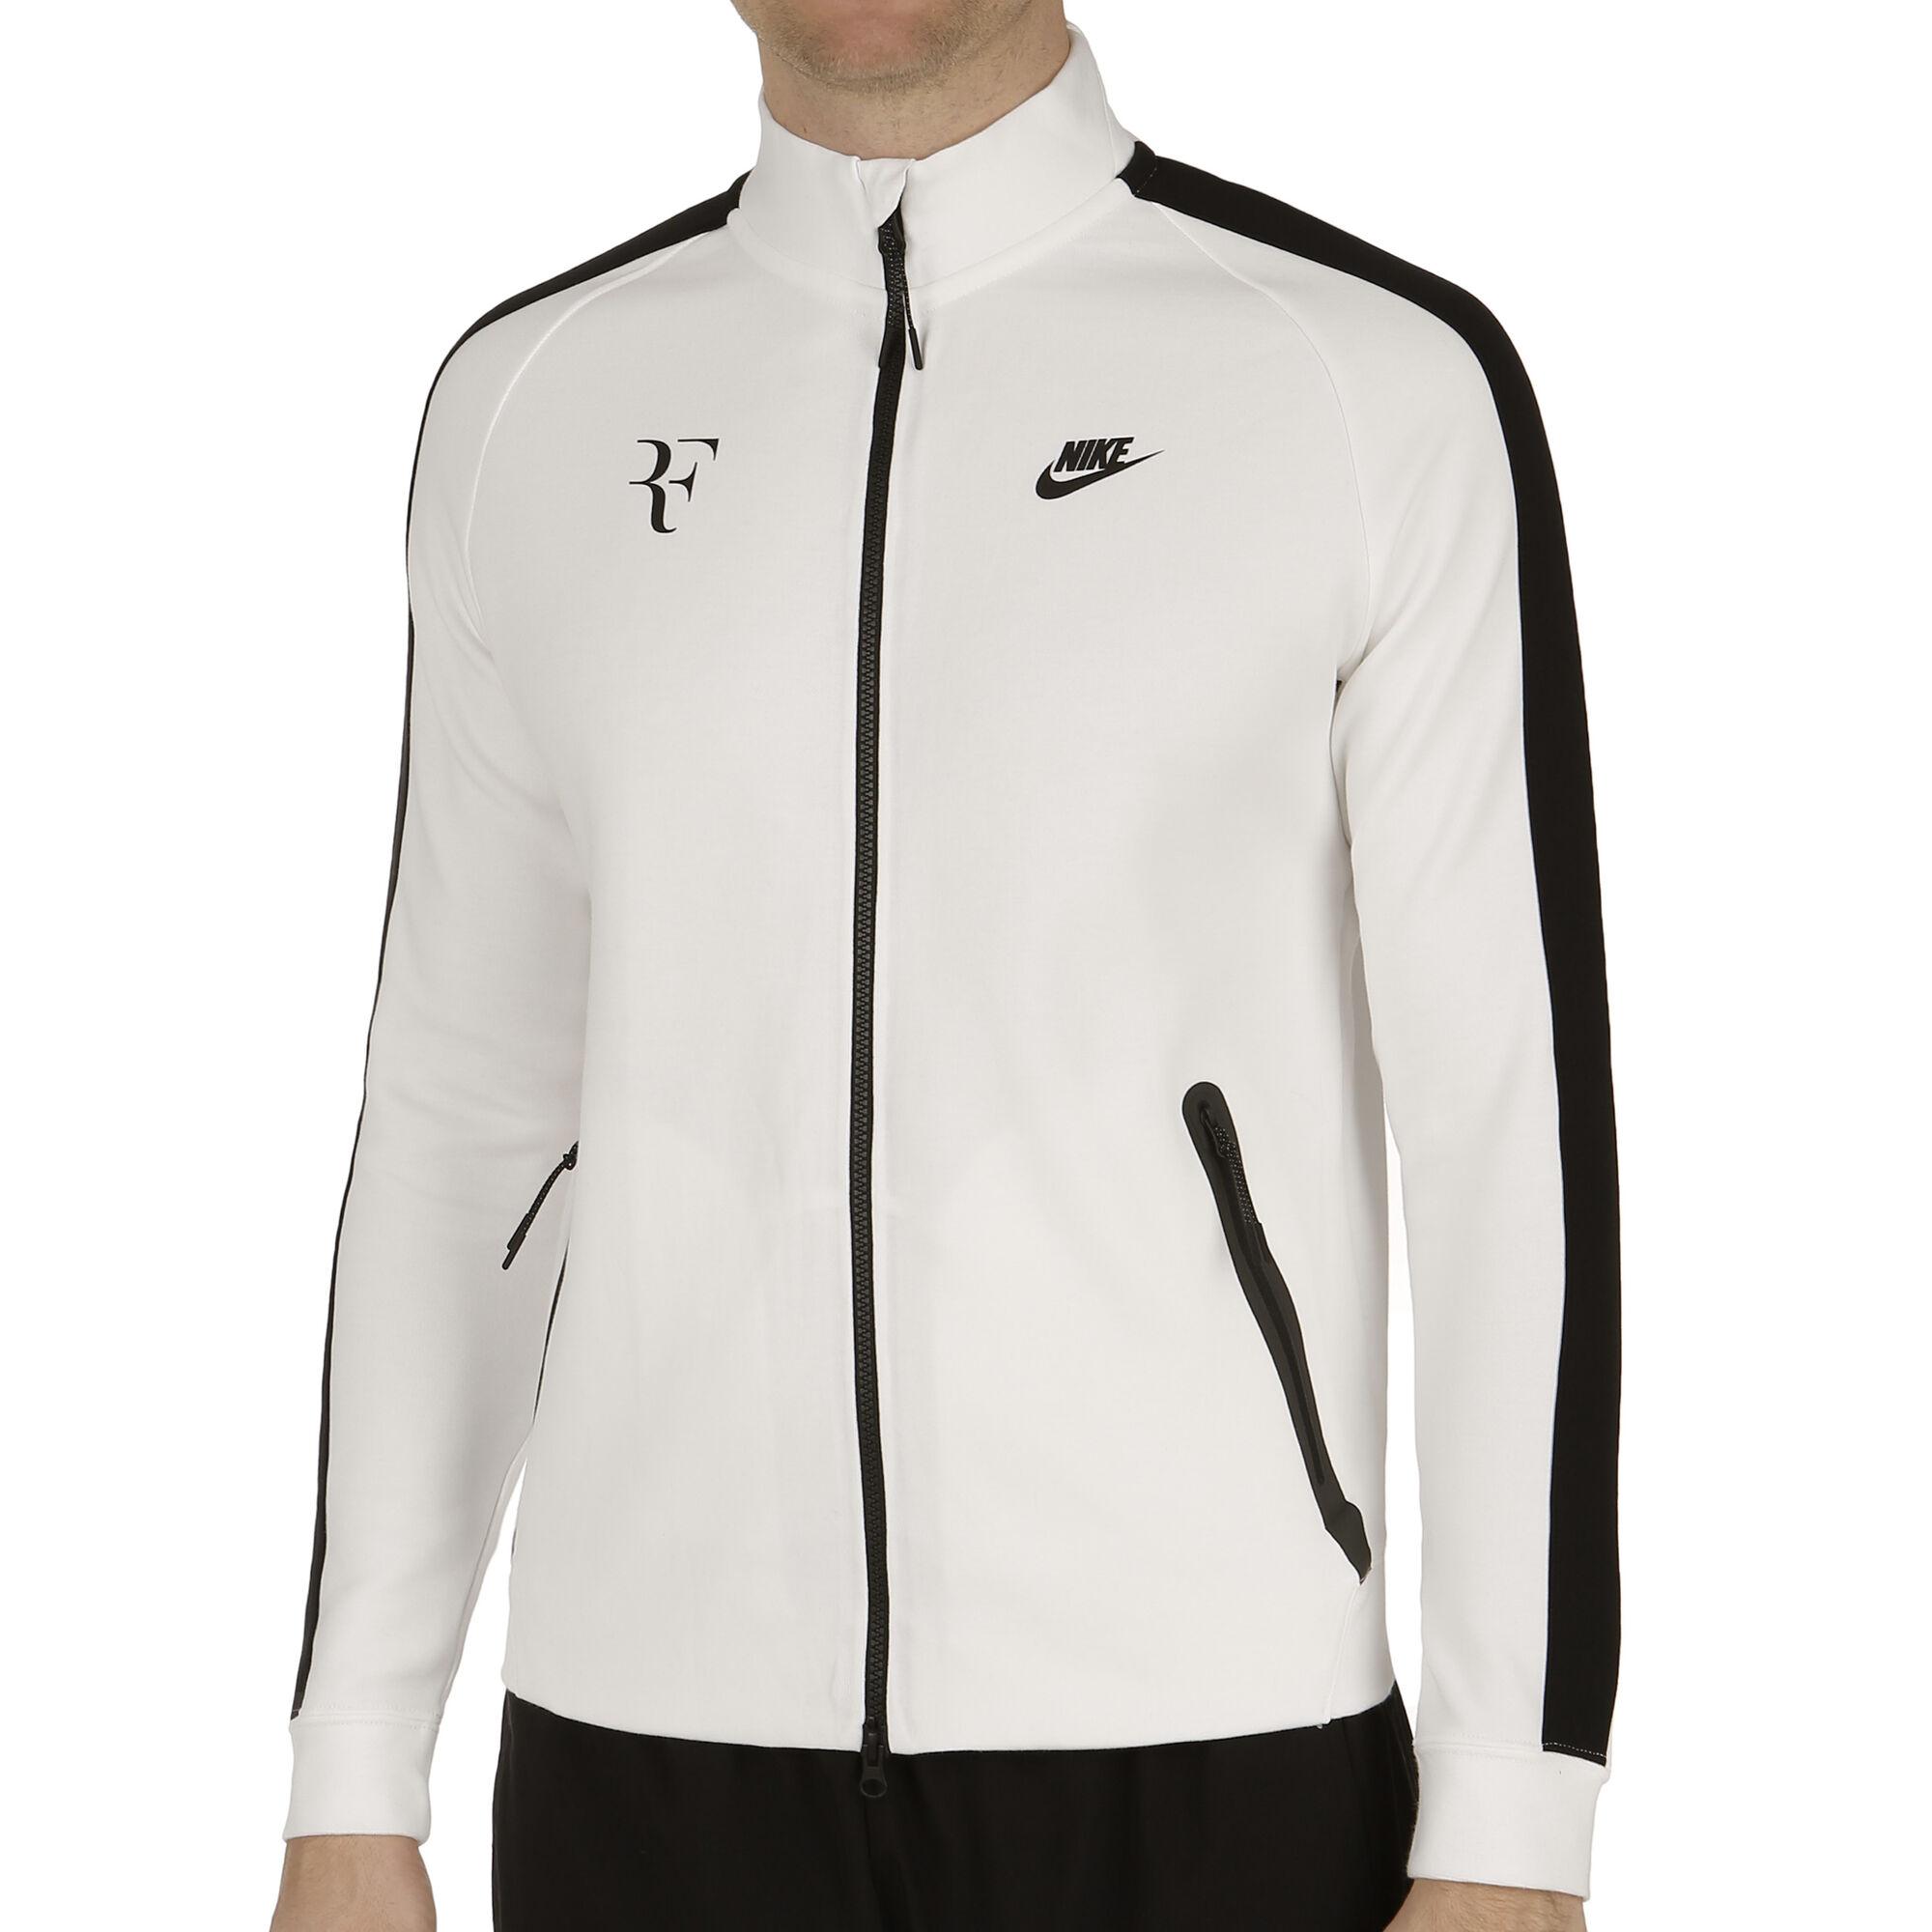 6b9aa550195 Nike Roger Federer Premier Tréninková Bunda Muži - Bílá